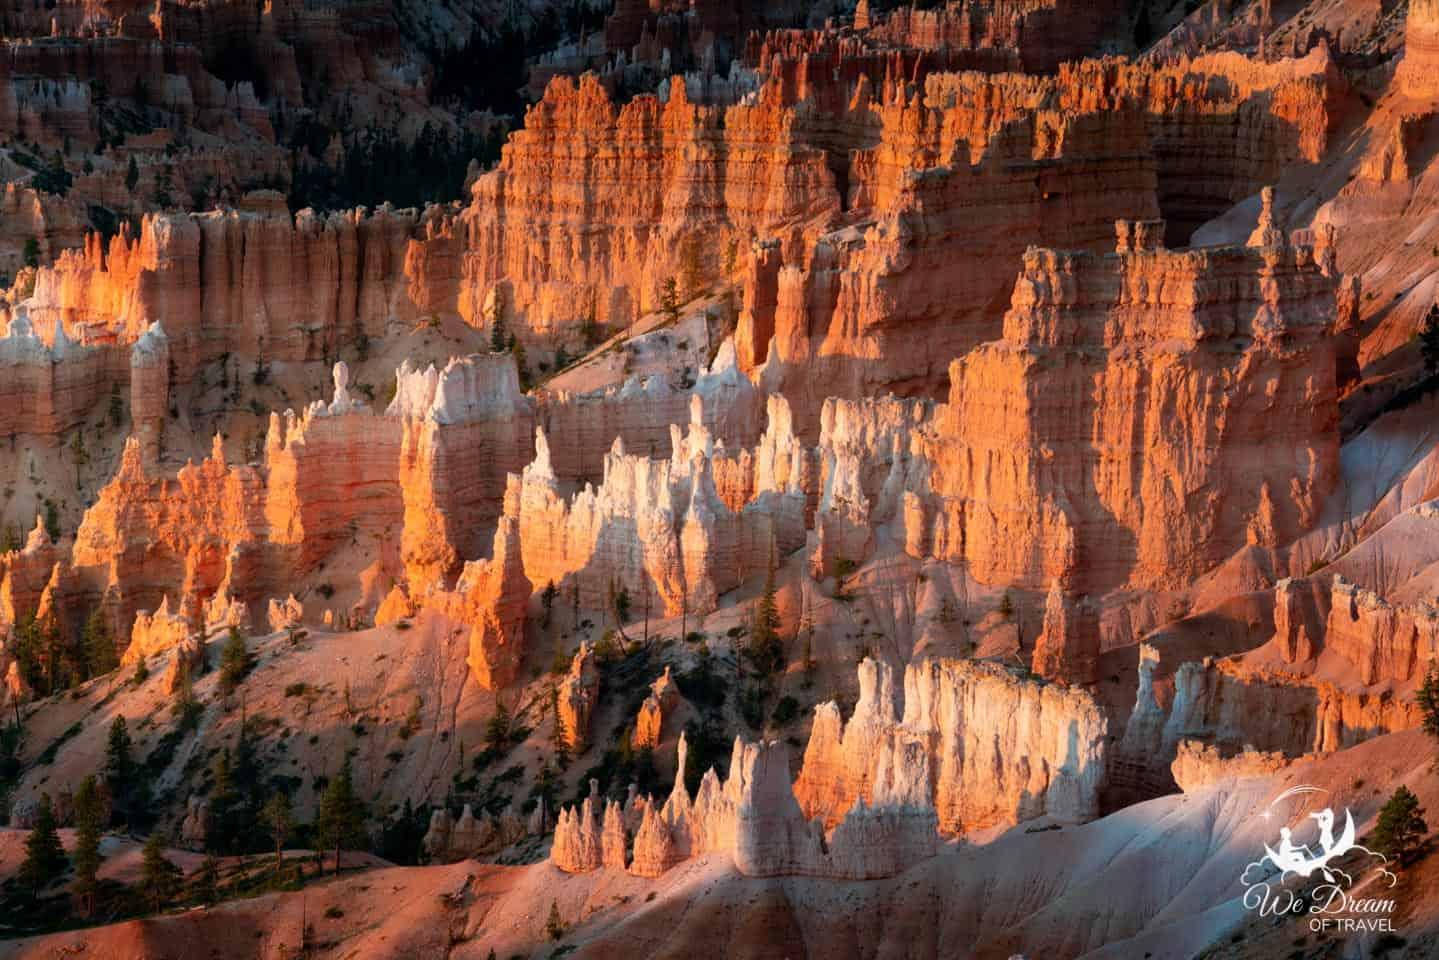 Sunrise at Bryce Canyon National Park.